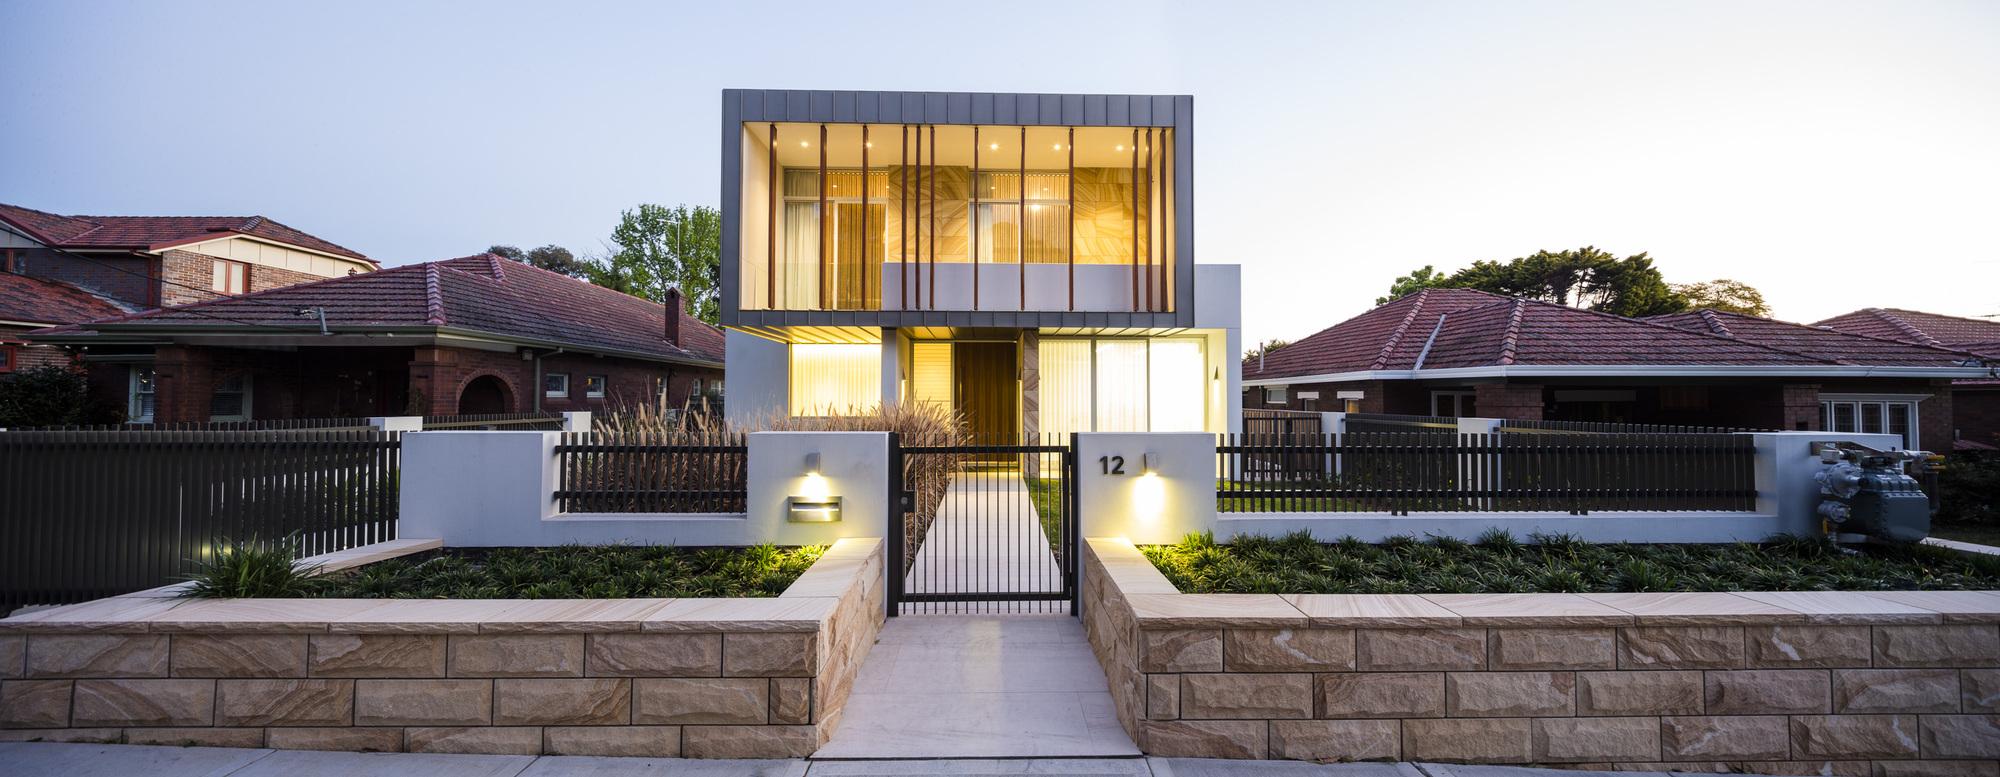 524b748ae8e44ecb17000391_box-house-zouk-architects_house040913_001.jpg